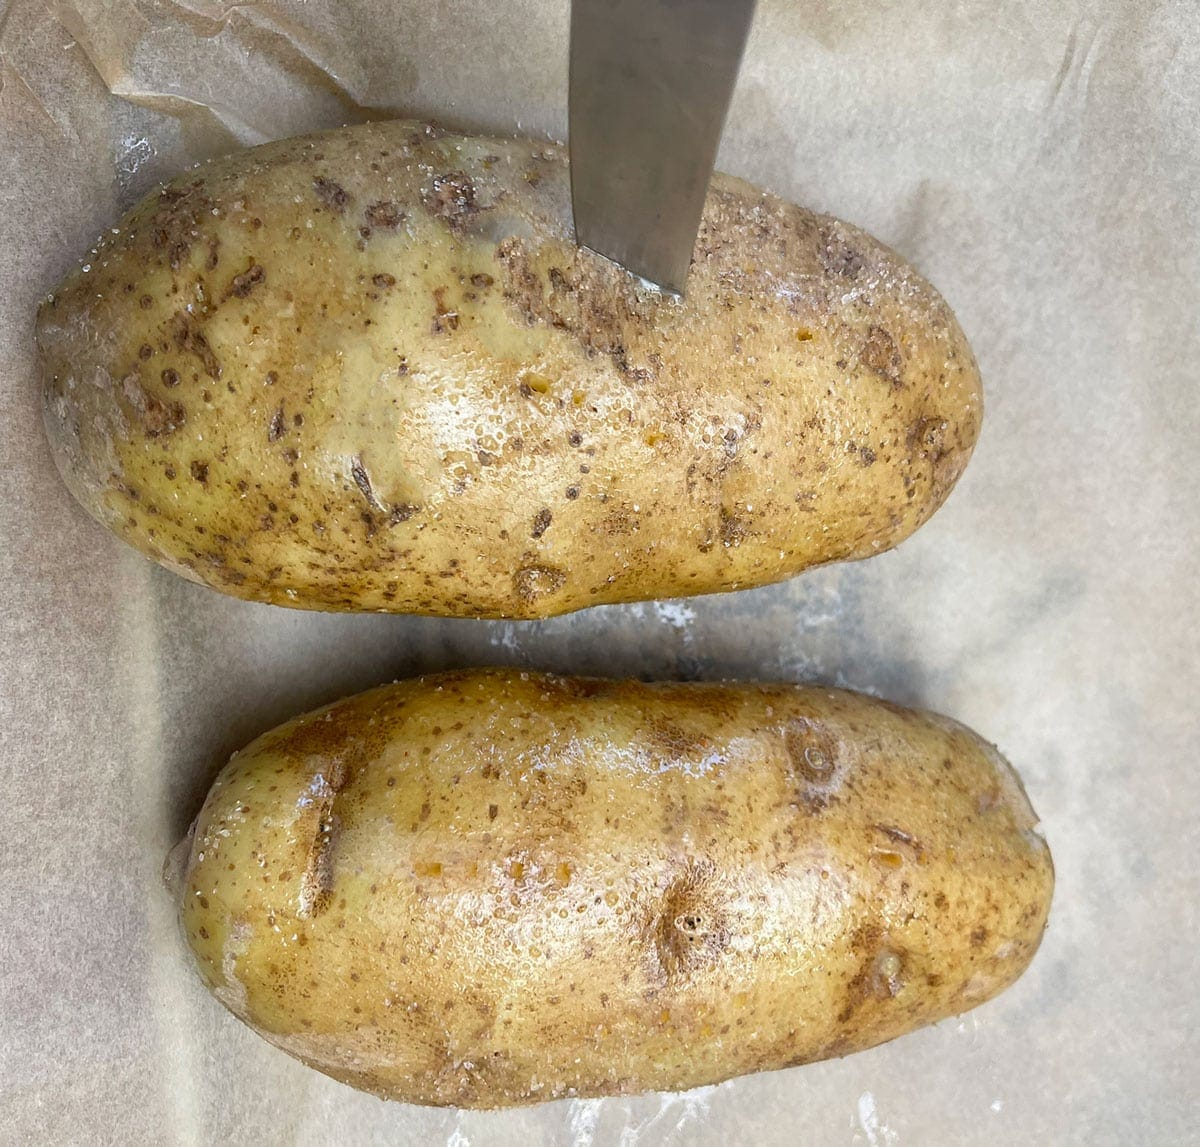 whole baked potato pierced with knife